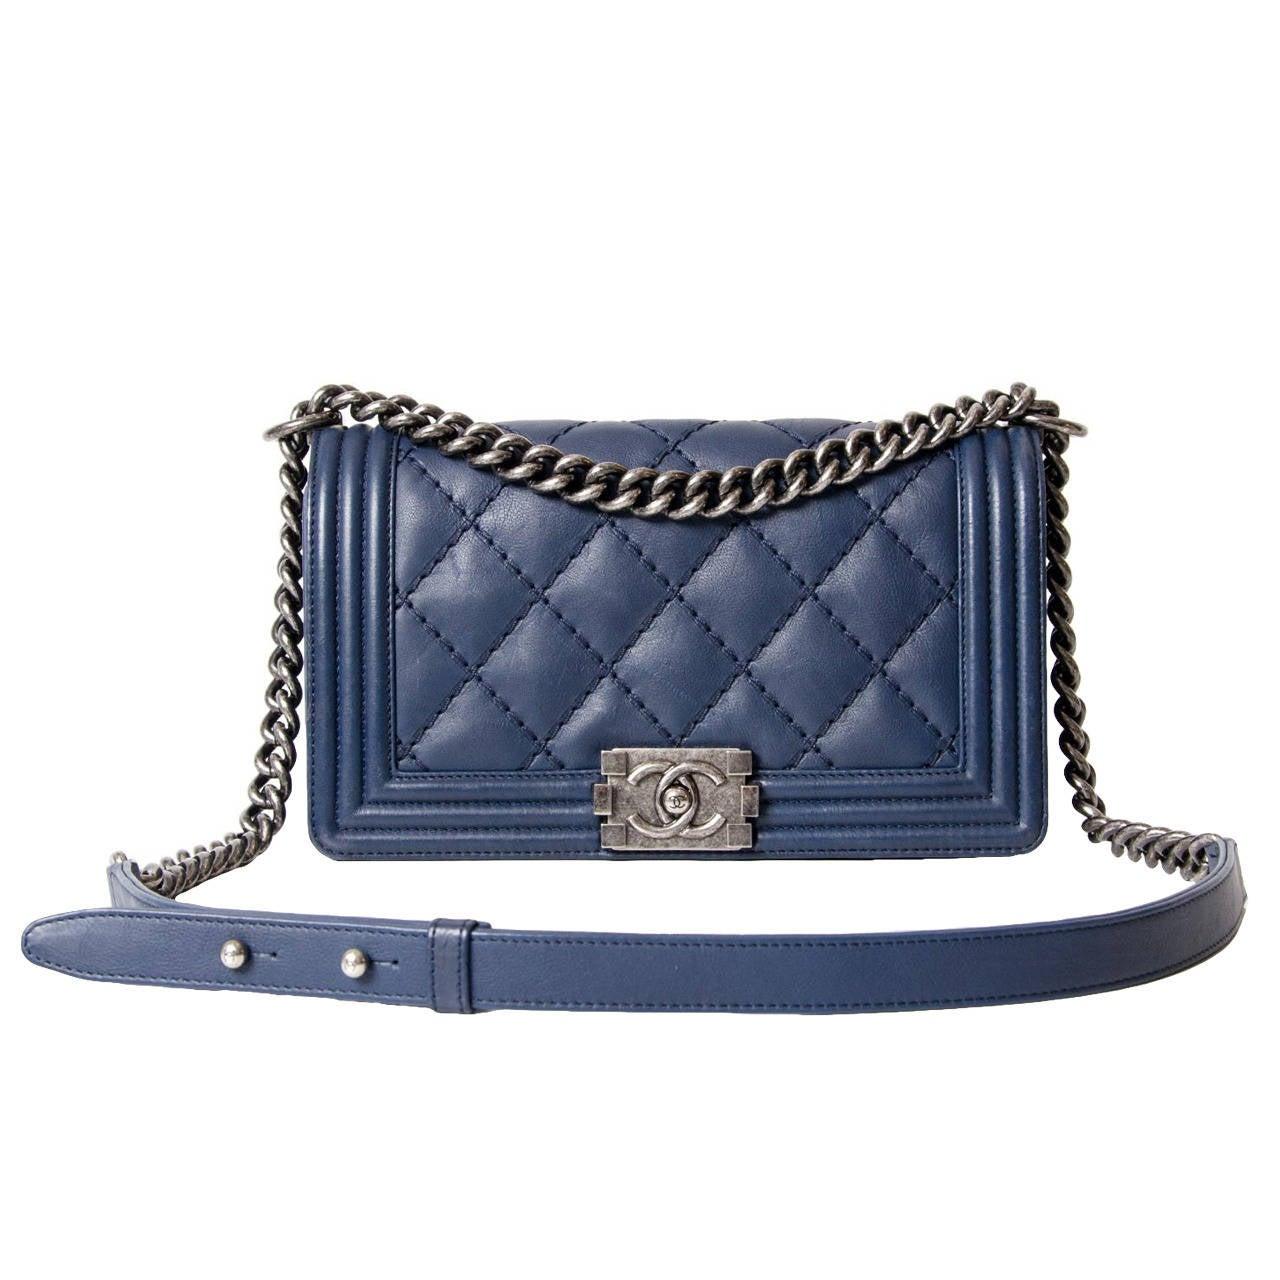 Chanel Lambskin Medium Quilted Boy Bag 1